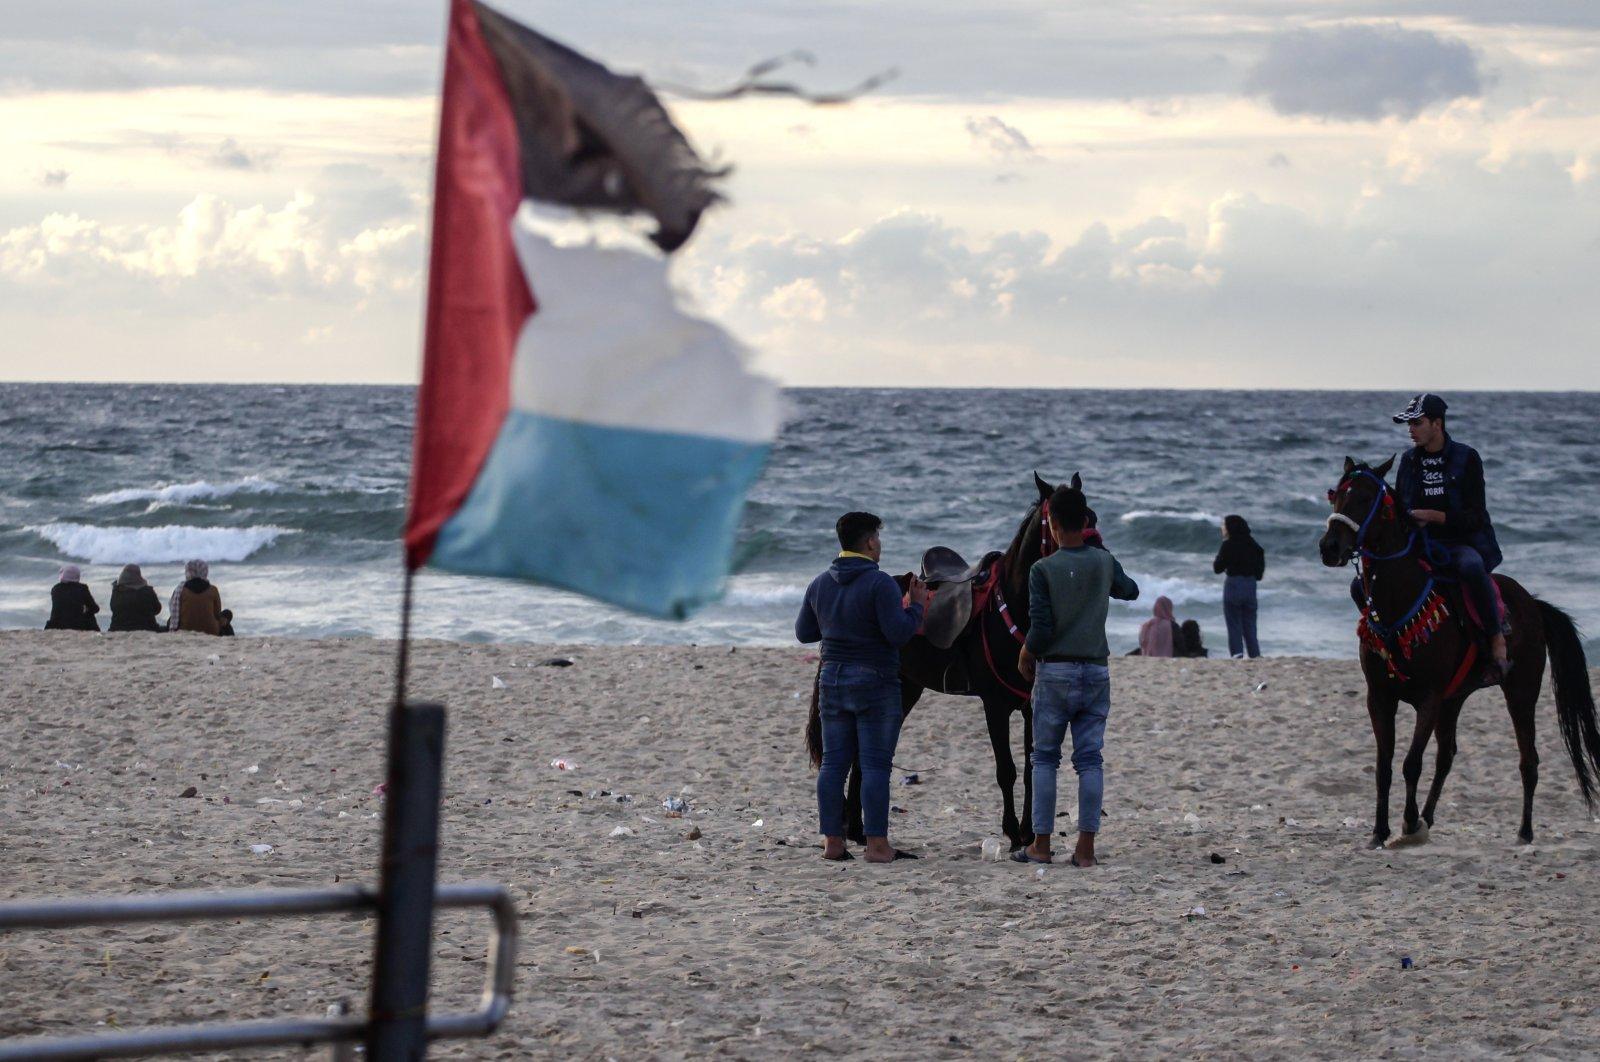 Palestinians enjoy Gaza Beach during sunset, Gaza Strip, Palestine, Nov. 25, 2020. (Photo by Getty Images)